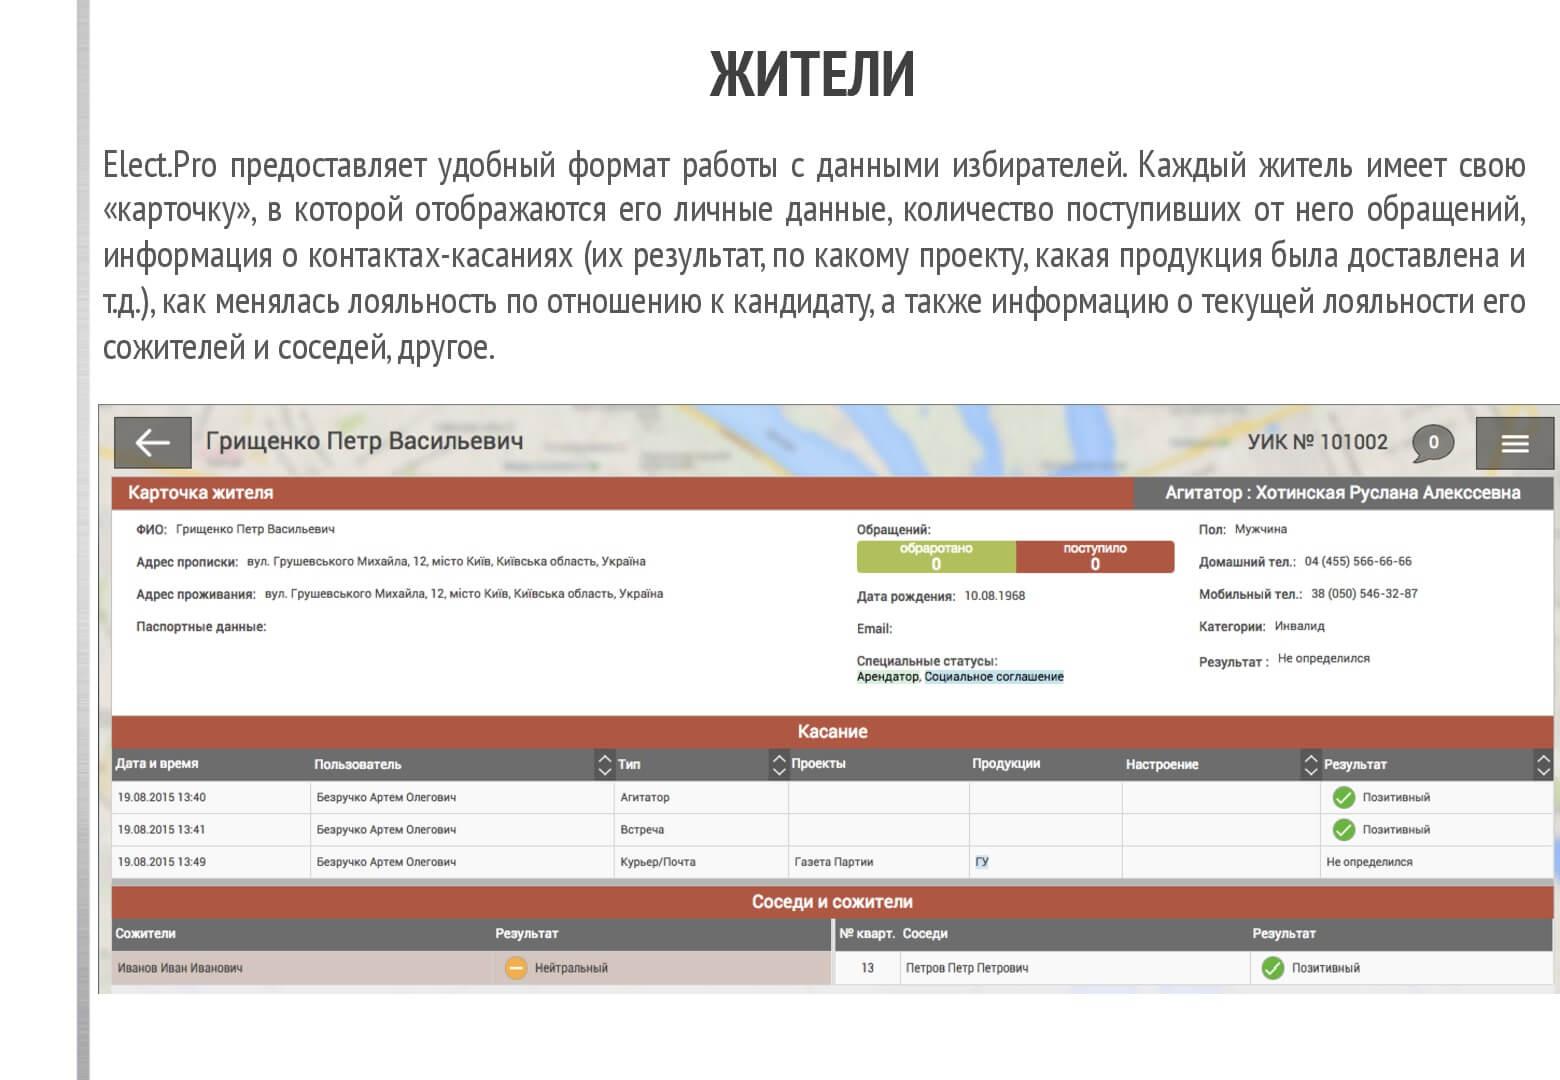 Elect.pro-BG-UA-005